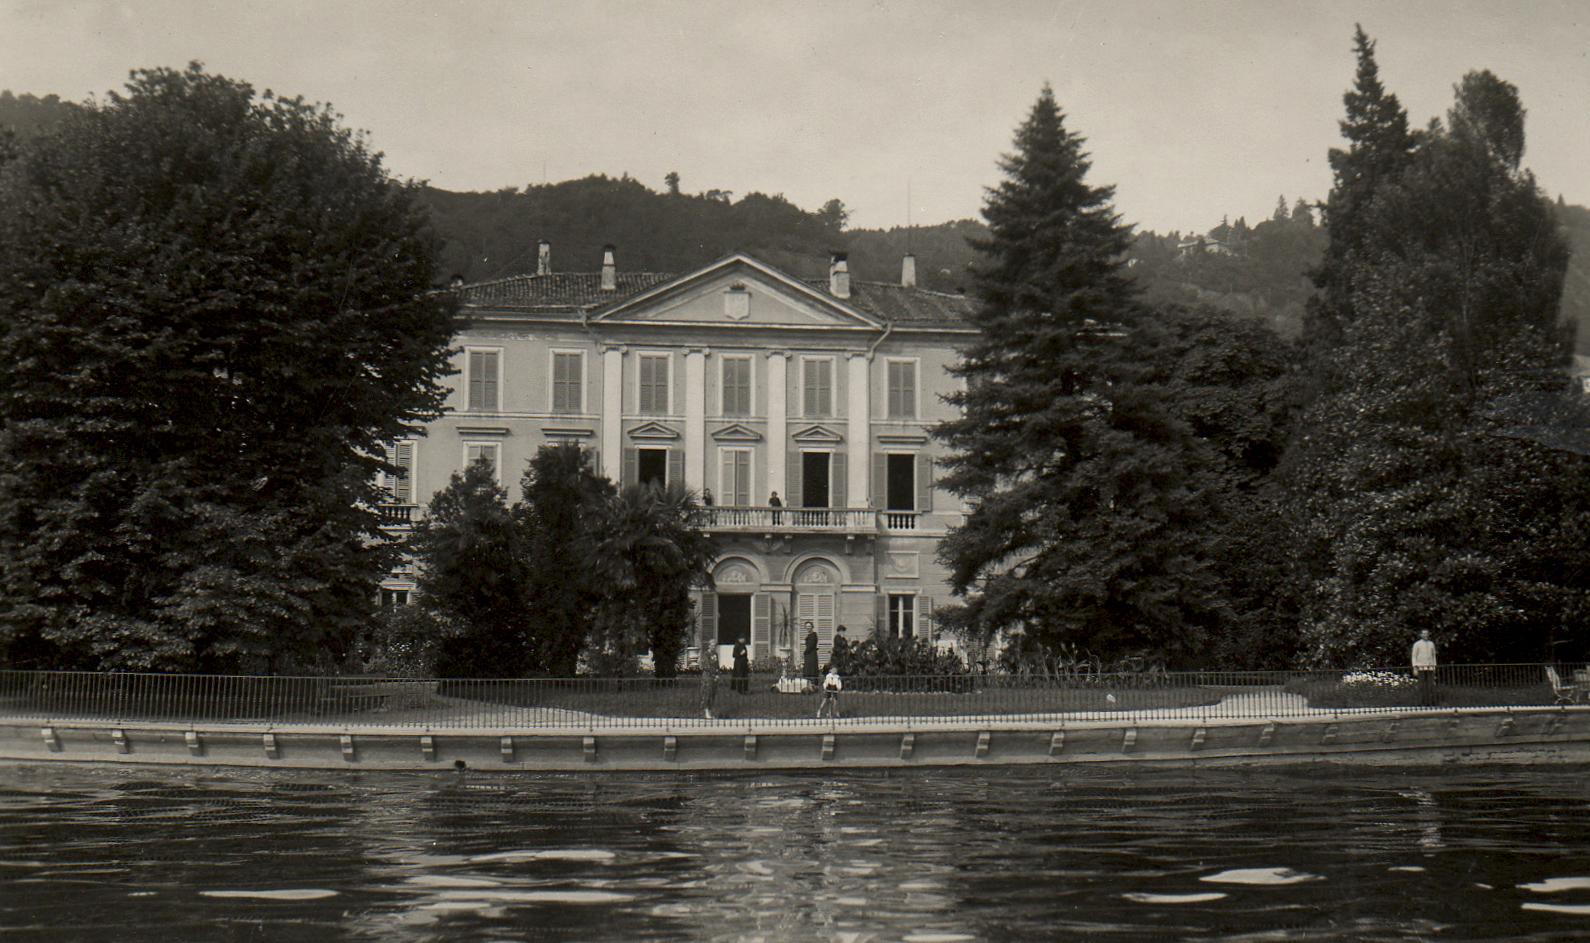 La residenza comasca del Generale Revel